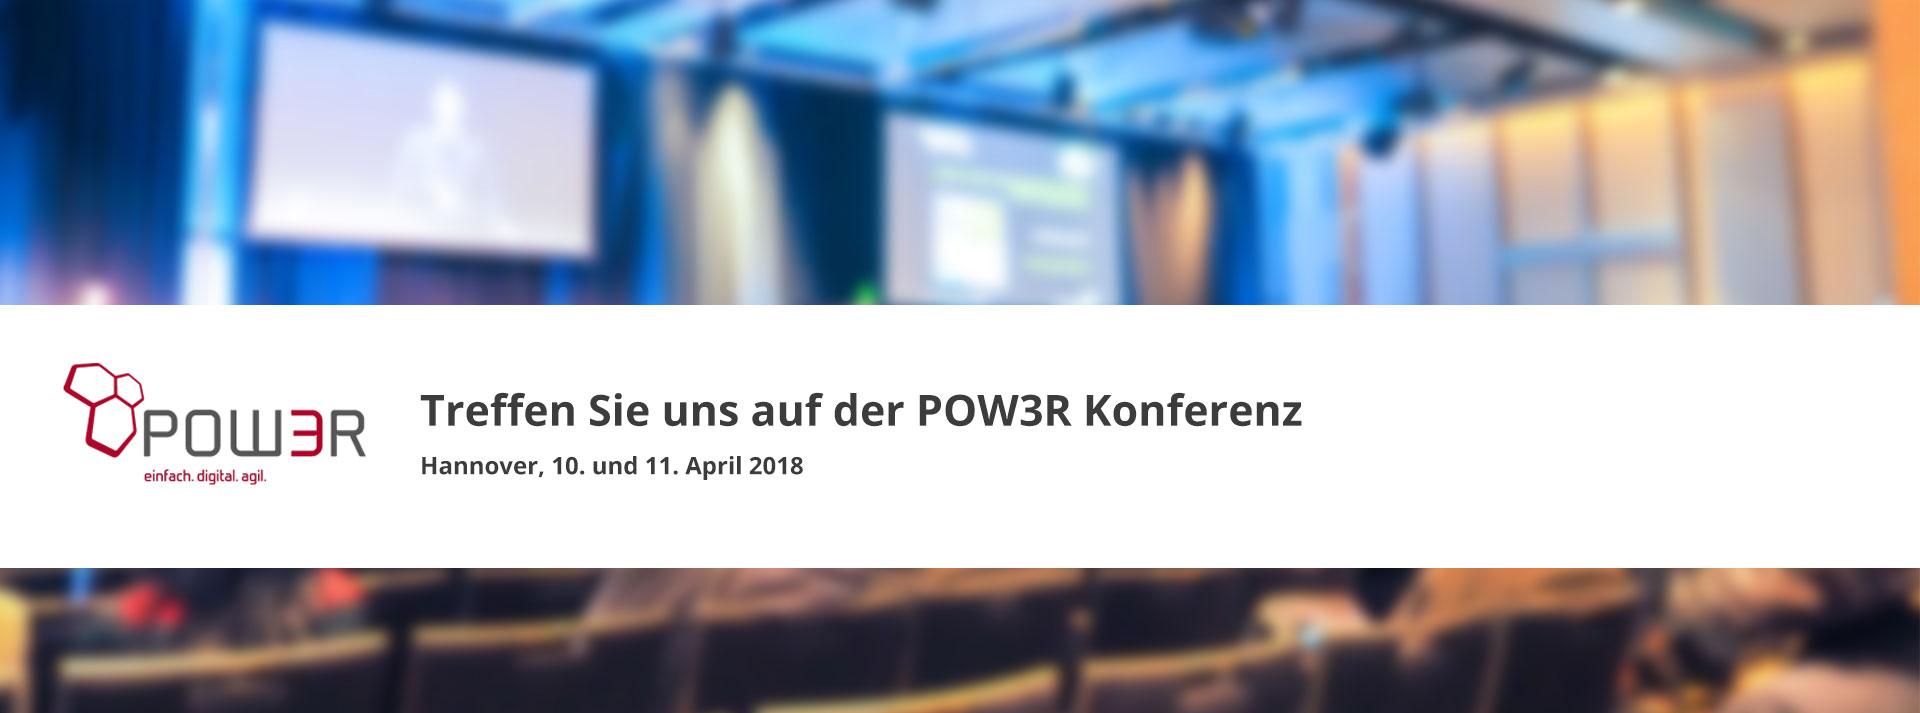 power hannover ibm edi midrange konferenz